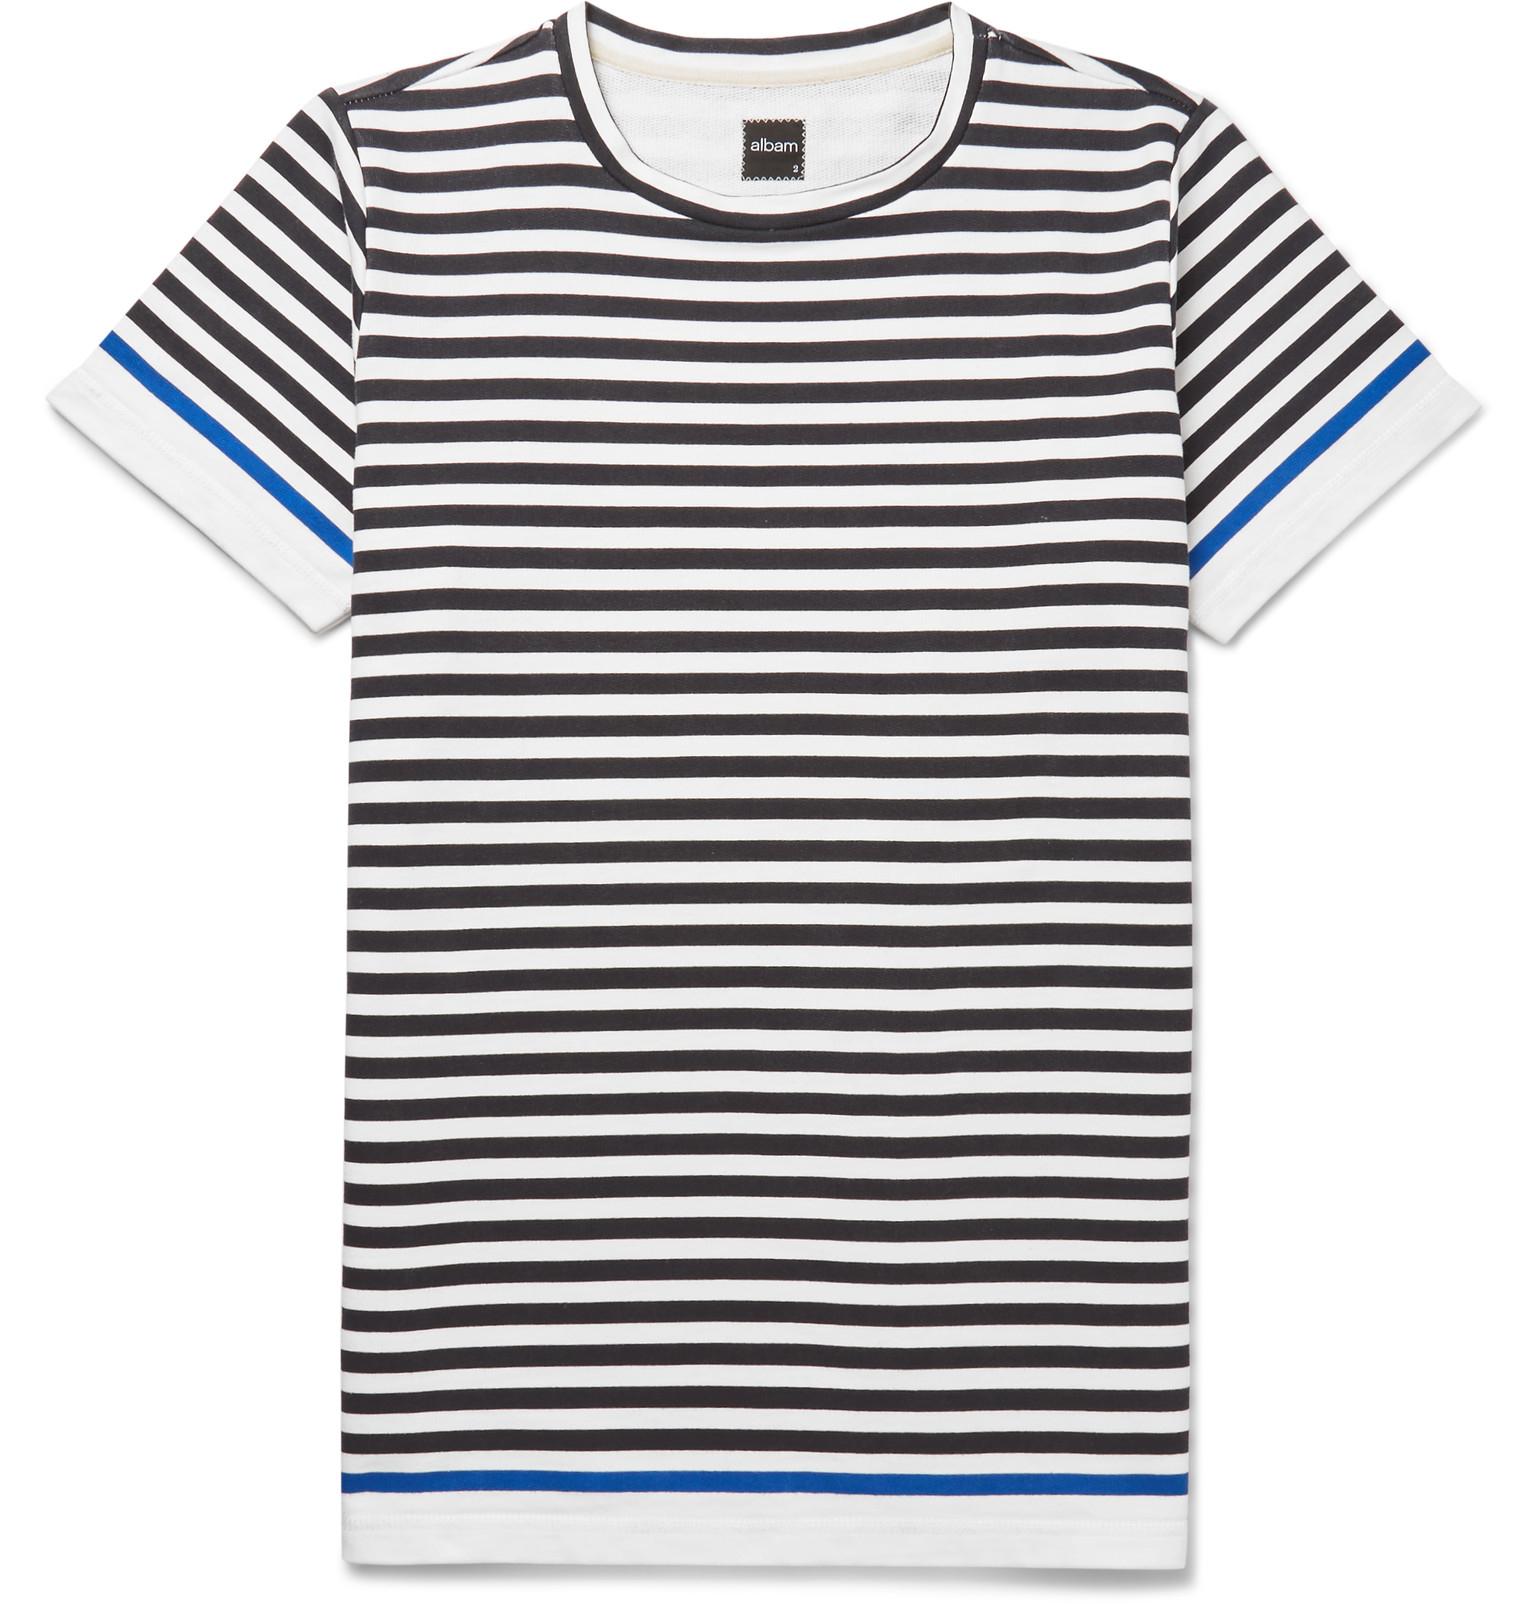 Nautical Striped Shirt Womens